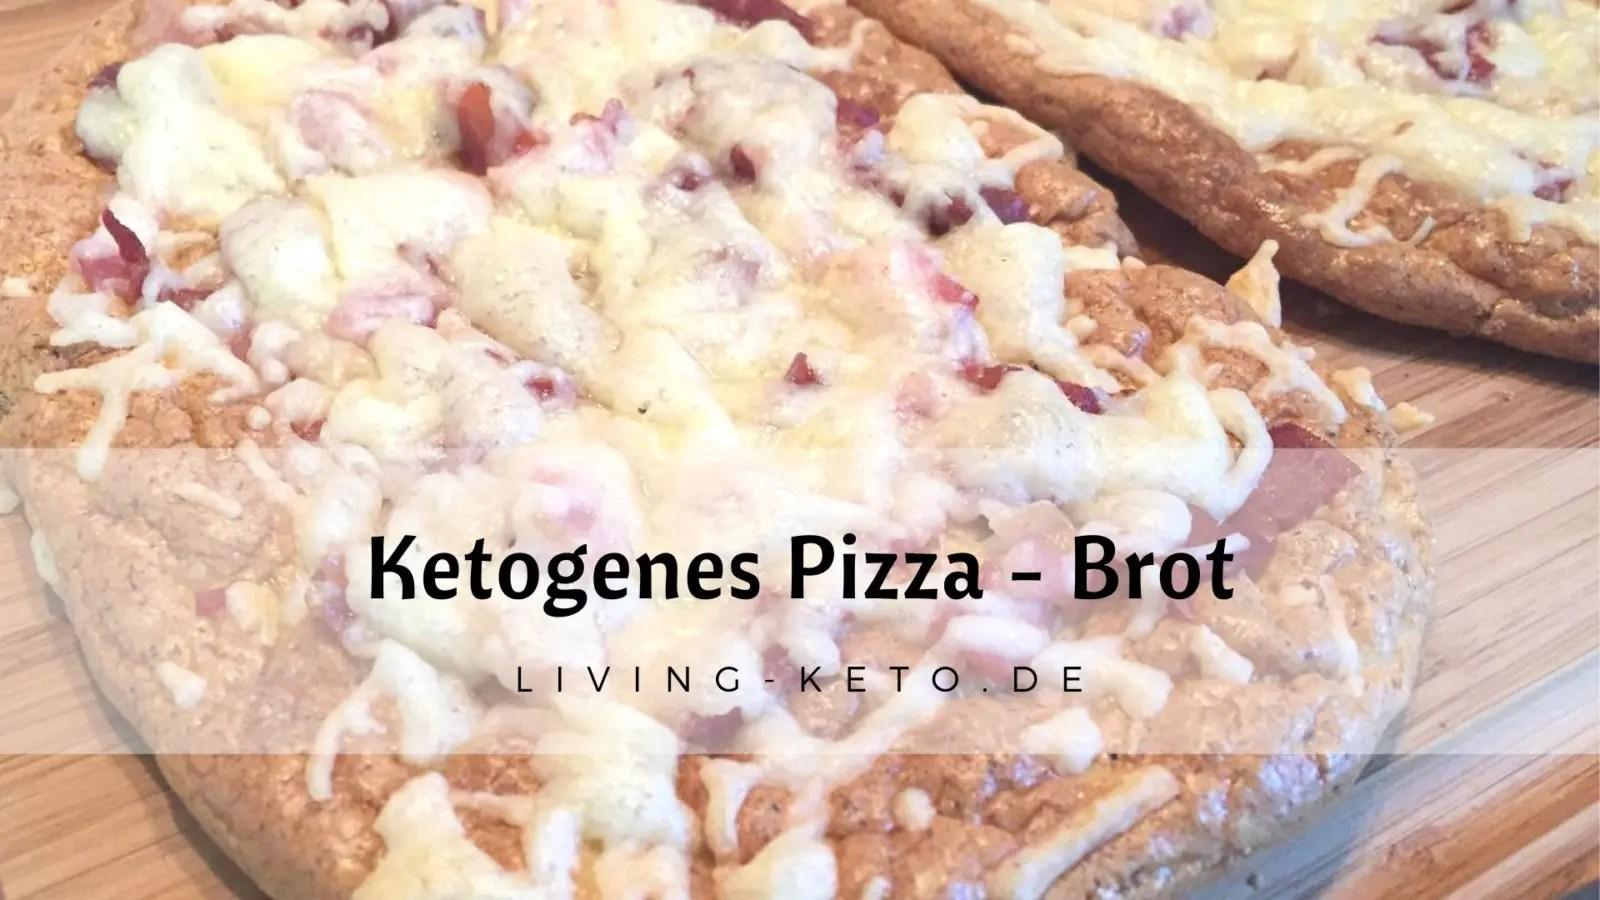 Ketogenes Pizza-Brot